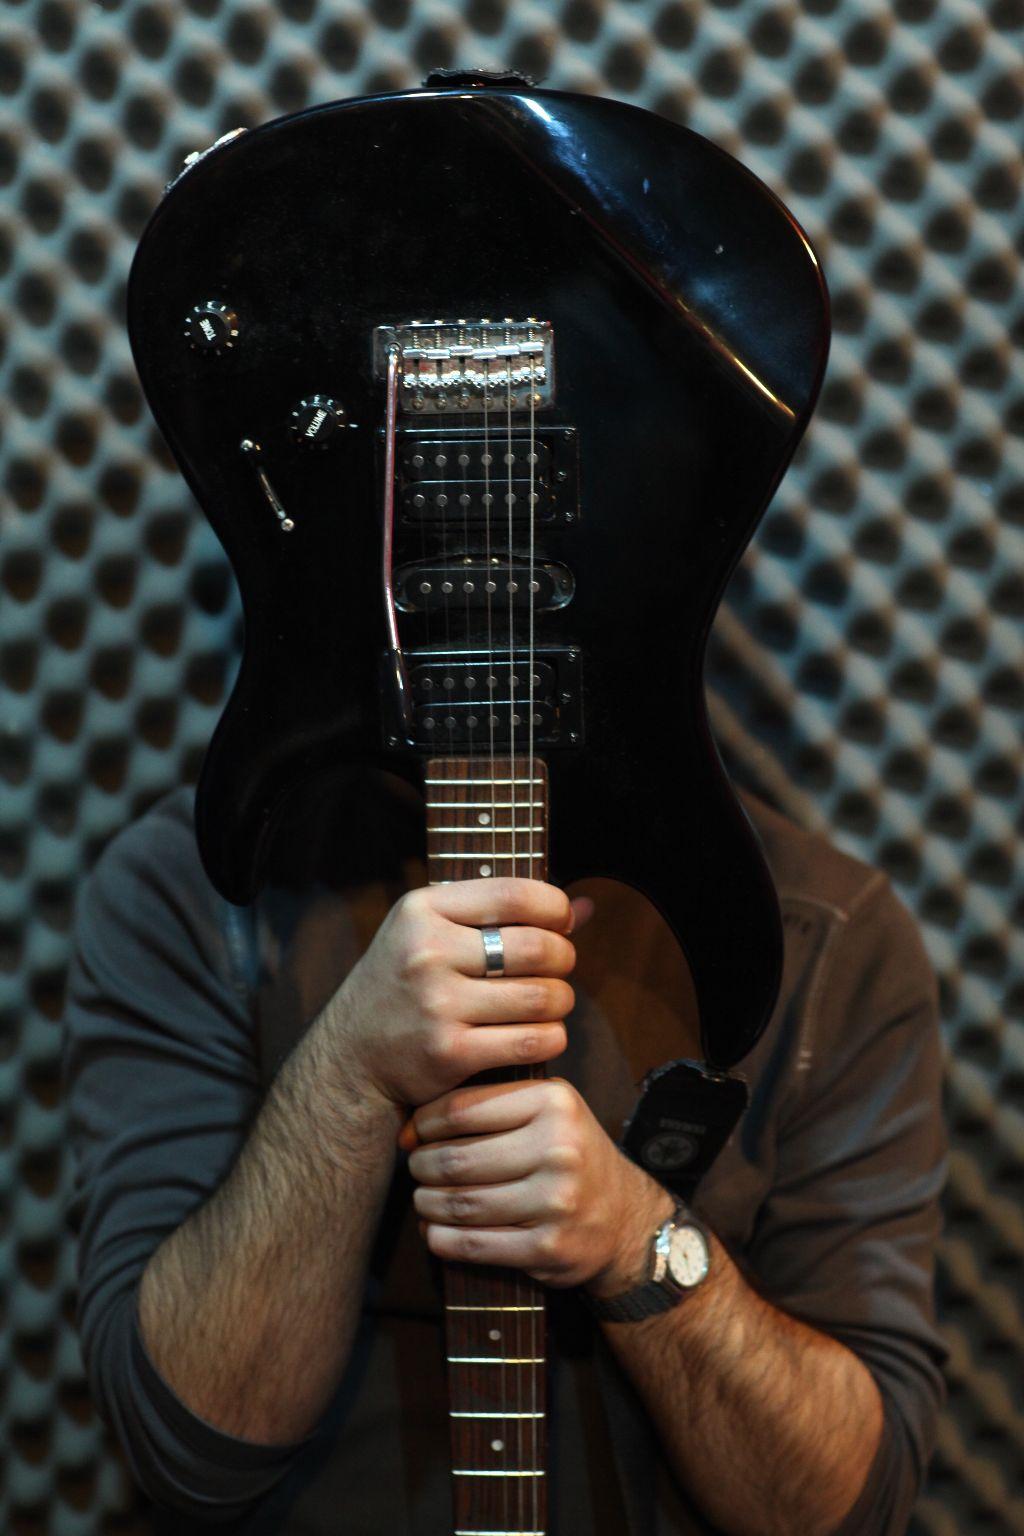 #freetoedit #musician #portrait